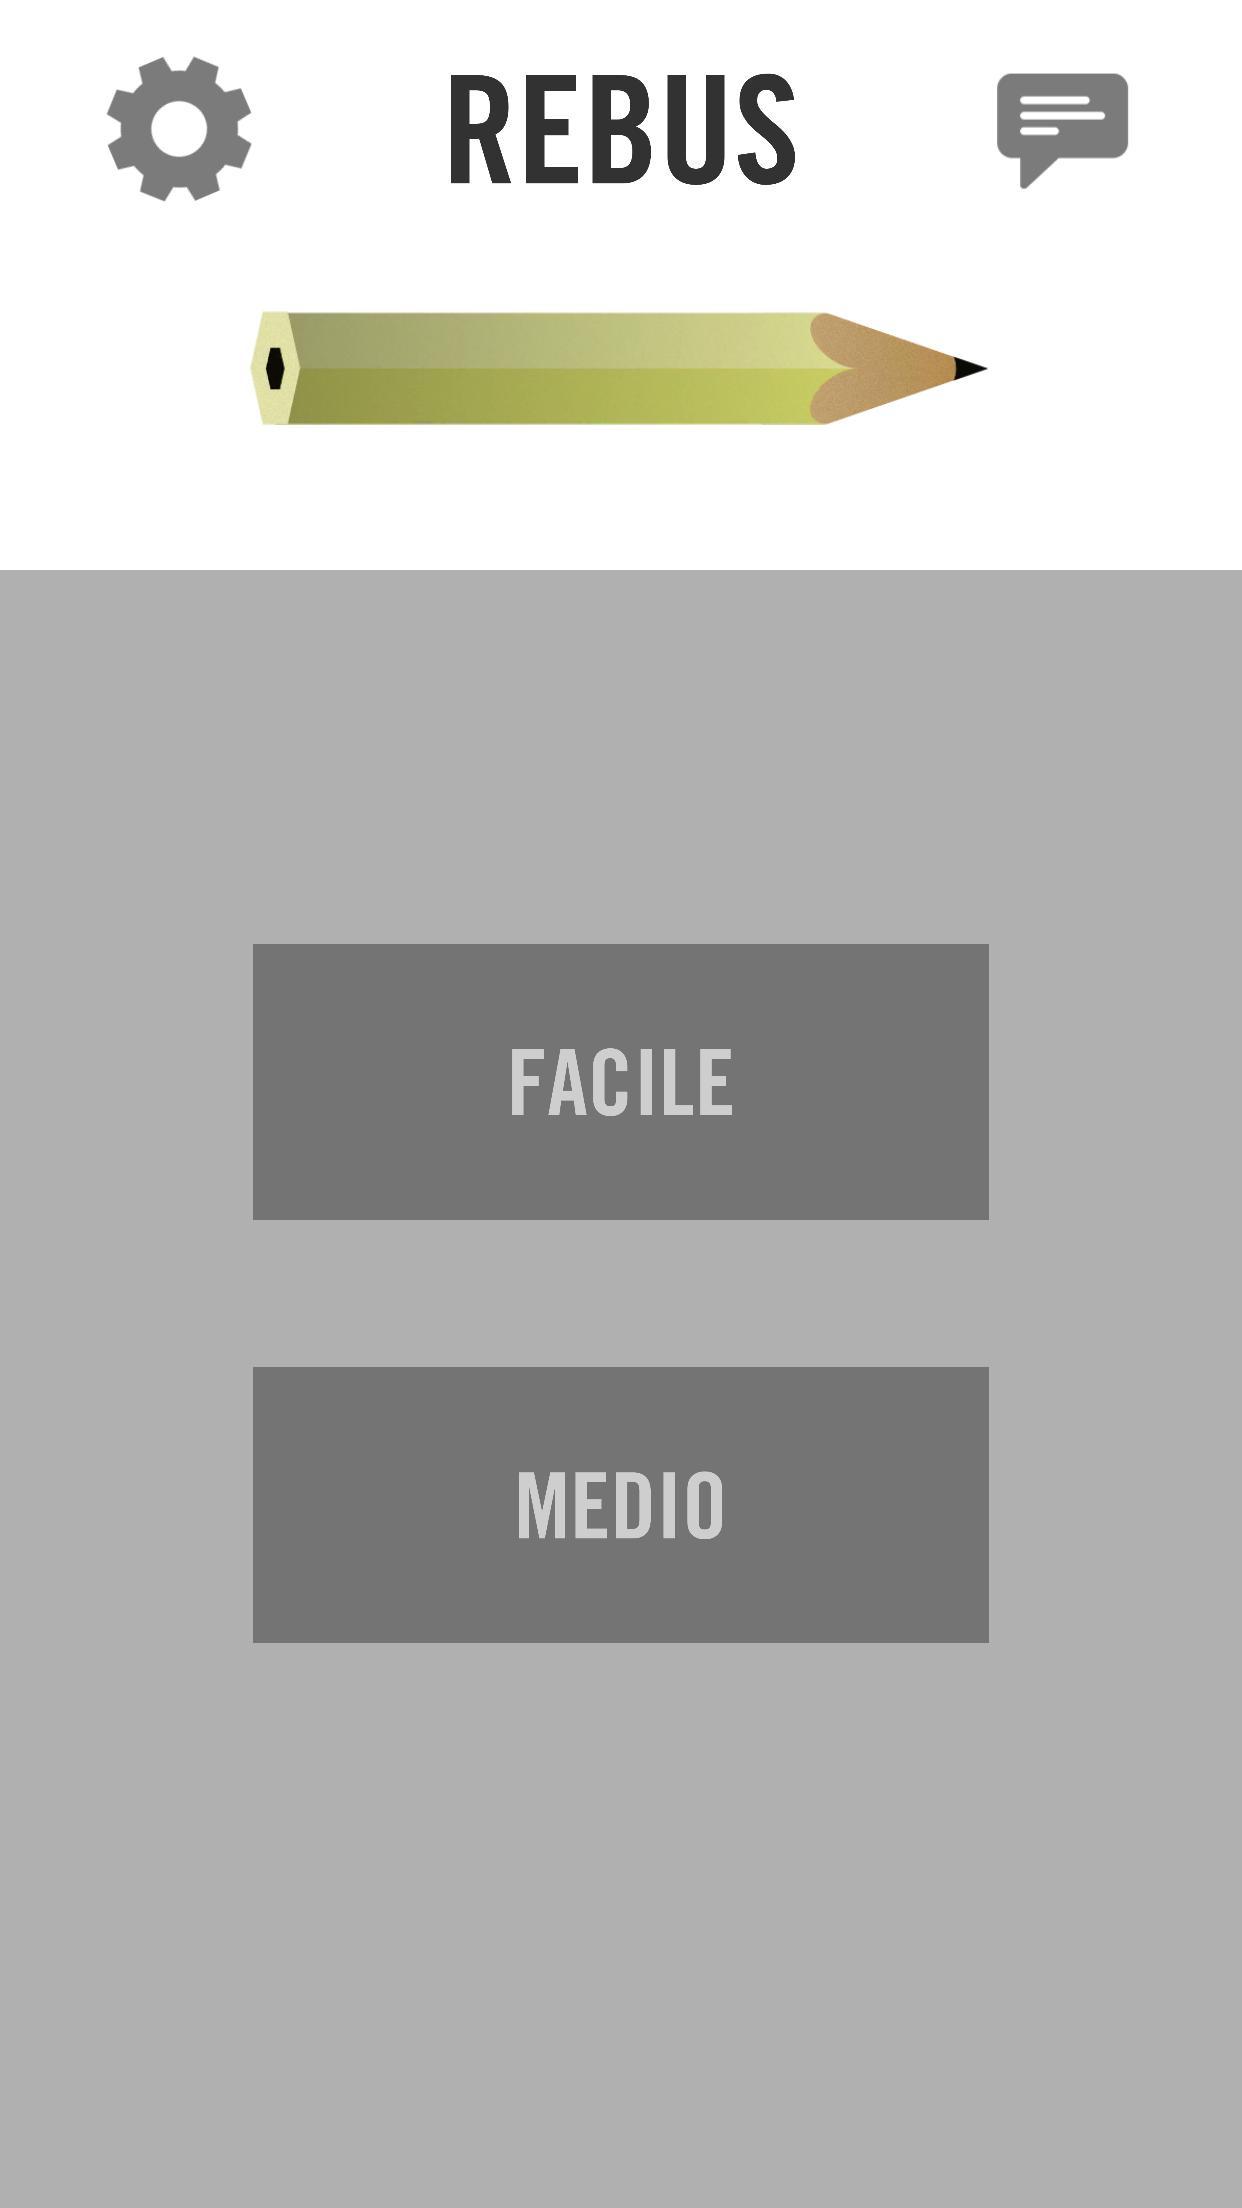 Android Için Rebus - Apk'yı İndir destiné Rébus Facile